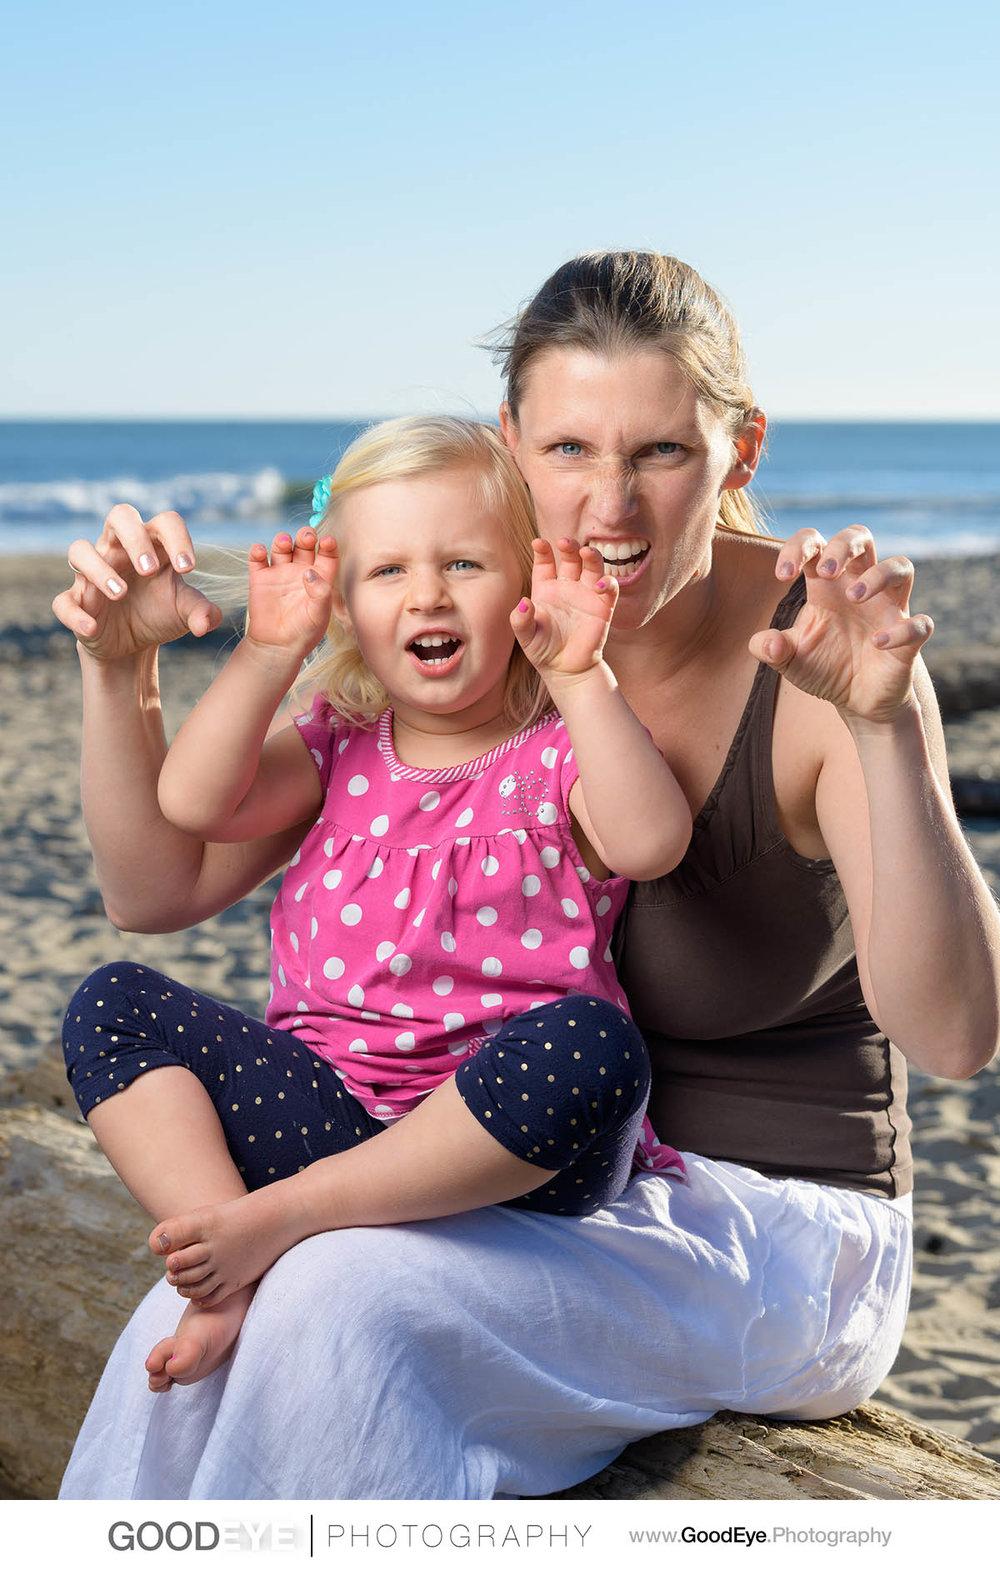 7649_Maja_and_Justin_Twin_Lakes_Beach_Santa_Cruz_Newborn_Family_Photogrraphy.jpg